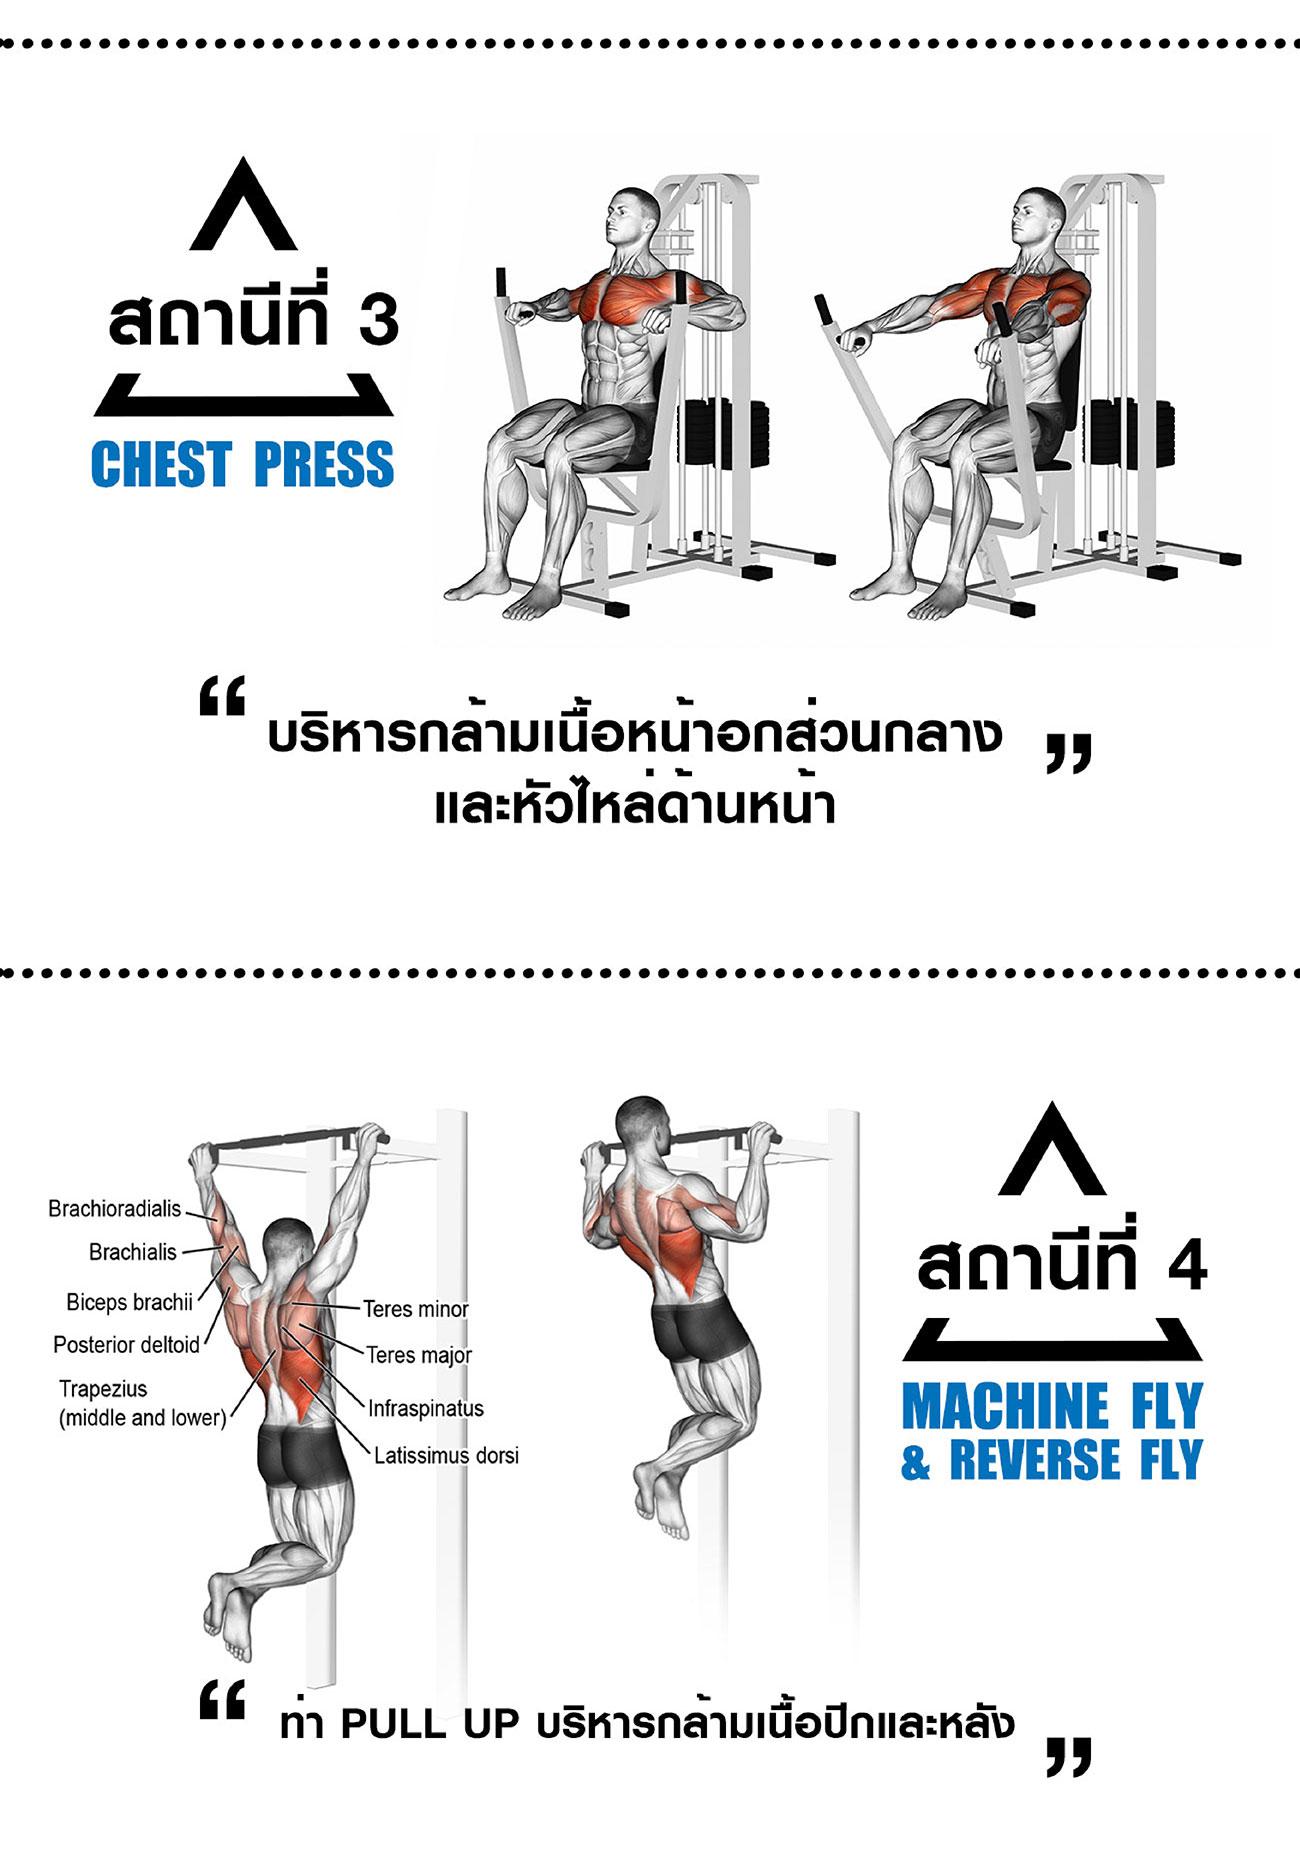 360 Ongsa Fitness 4 Station Pectoral - Chest Press - Leg Press - Power Tower